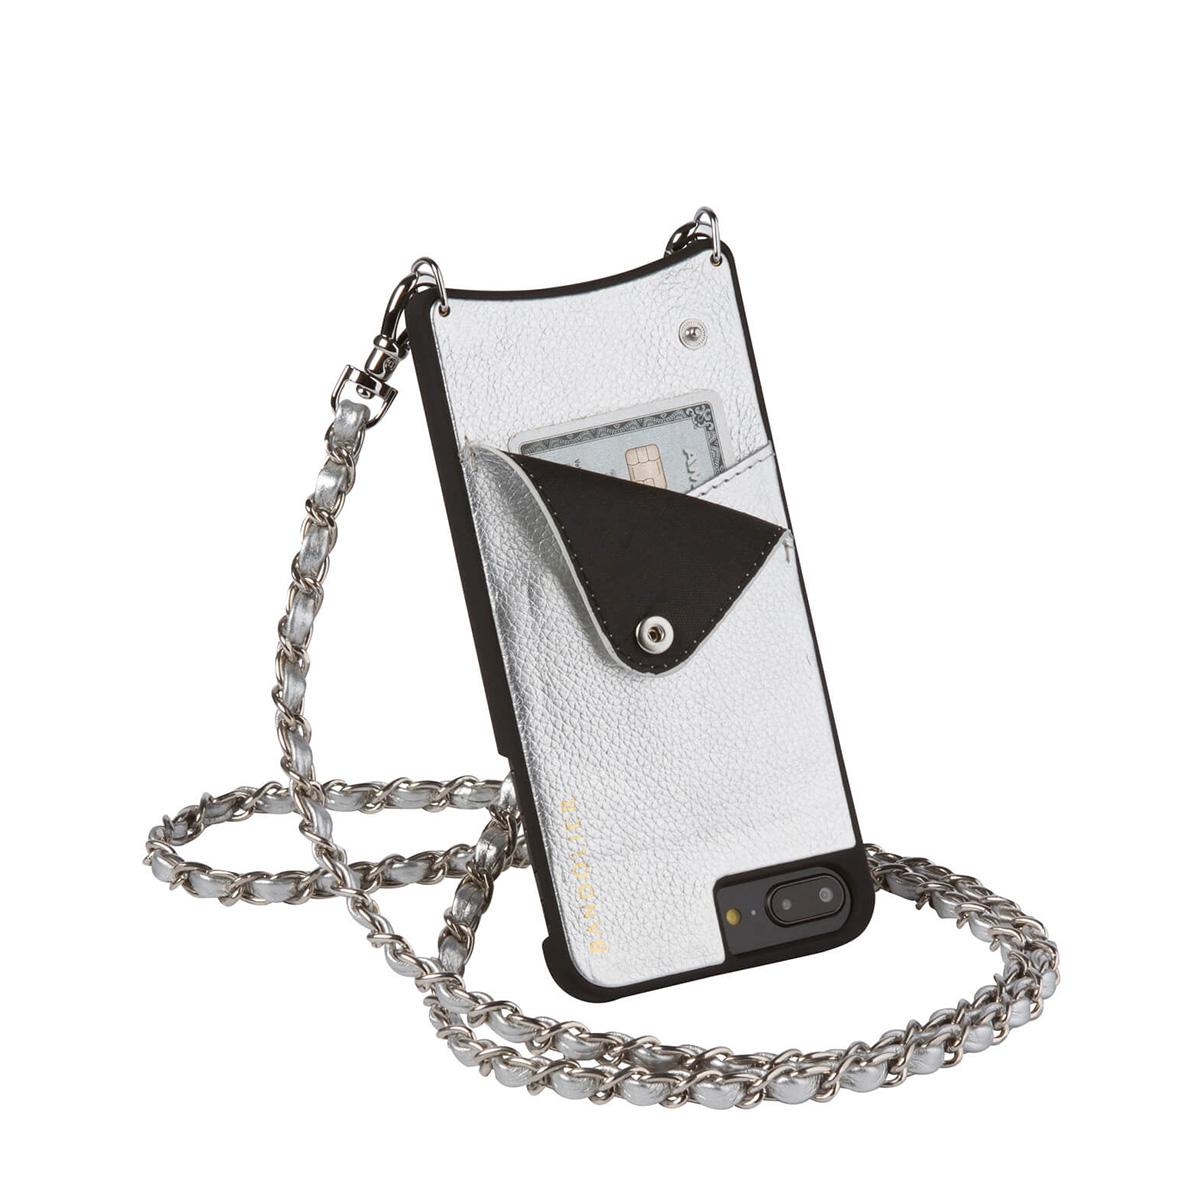 BANDOLIER iPhone8Plus iPhone7Plus 6sPlus LUCY RICH SILVER バンドリヤー ケース スマホ アイフォン プラス メンズ レディース [1811]